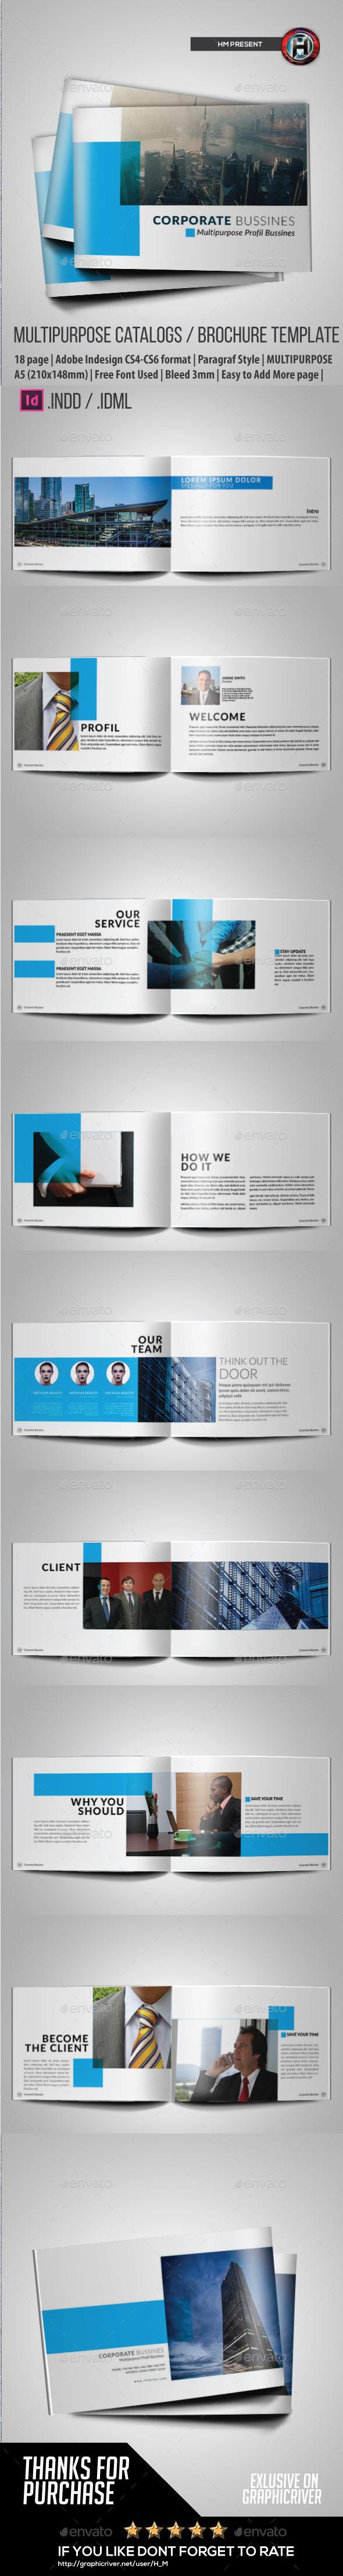 Business Brochure Indesign Horizontal - Brochures Print Templates